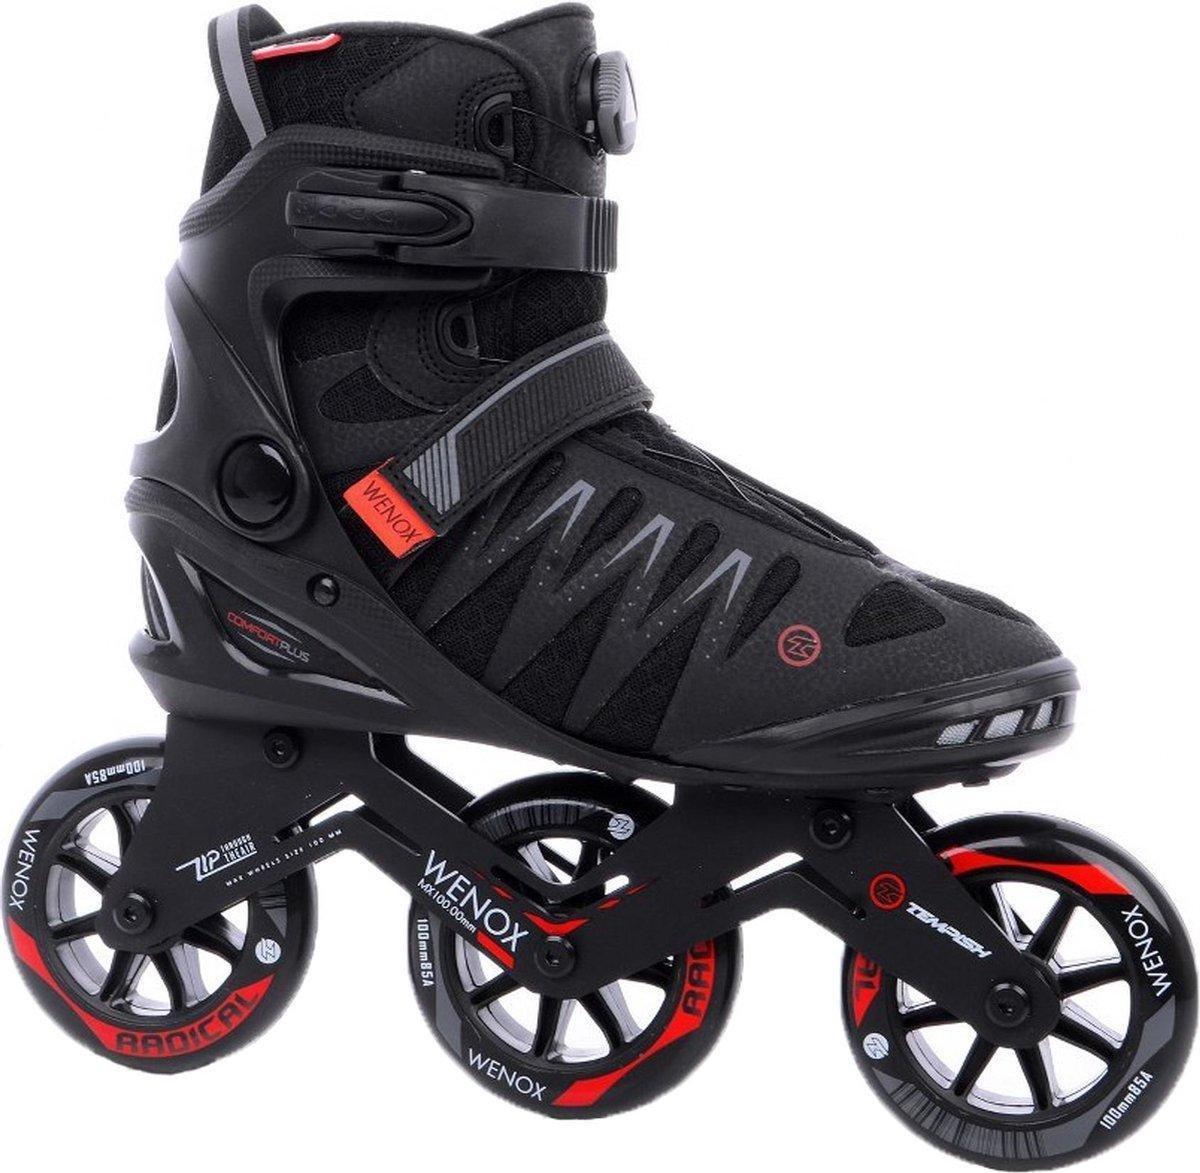 Tempish - Skeelers - Wenox - Top 100 - Zwart/Rood - Maat 43 - Heren - Skates